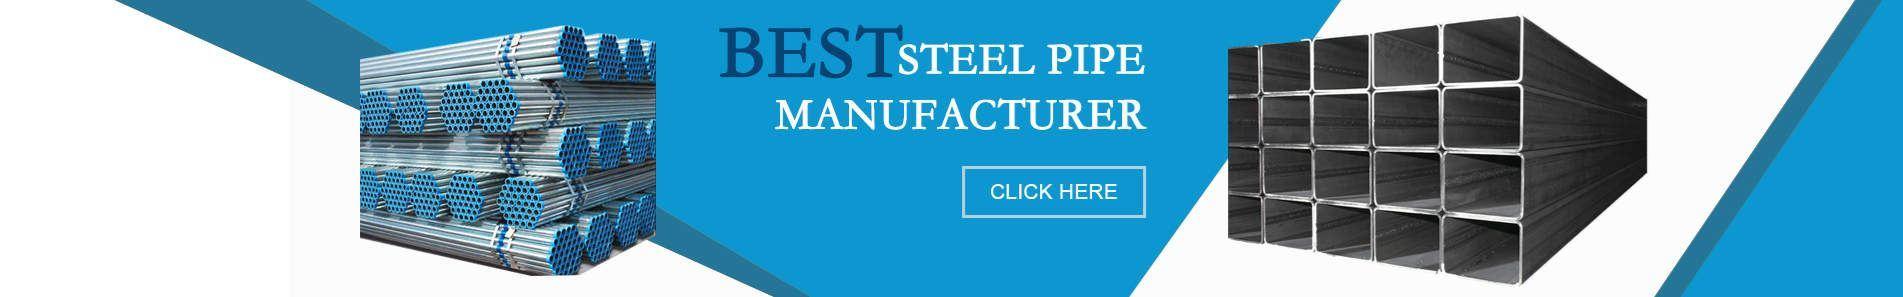 lsaw-steel-tube